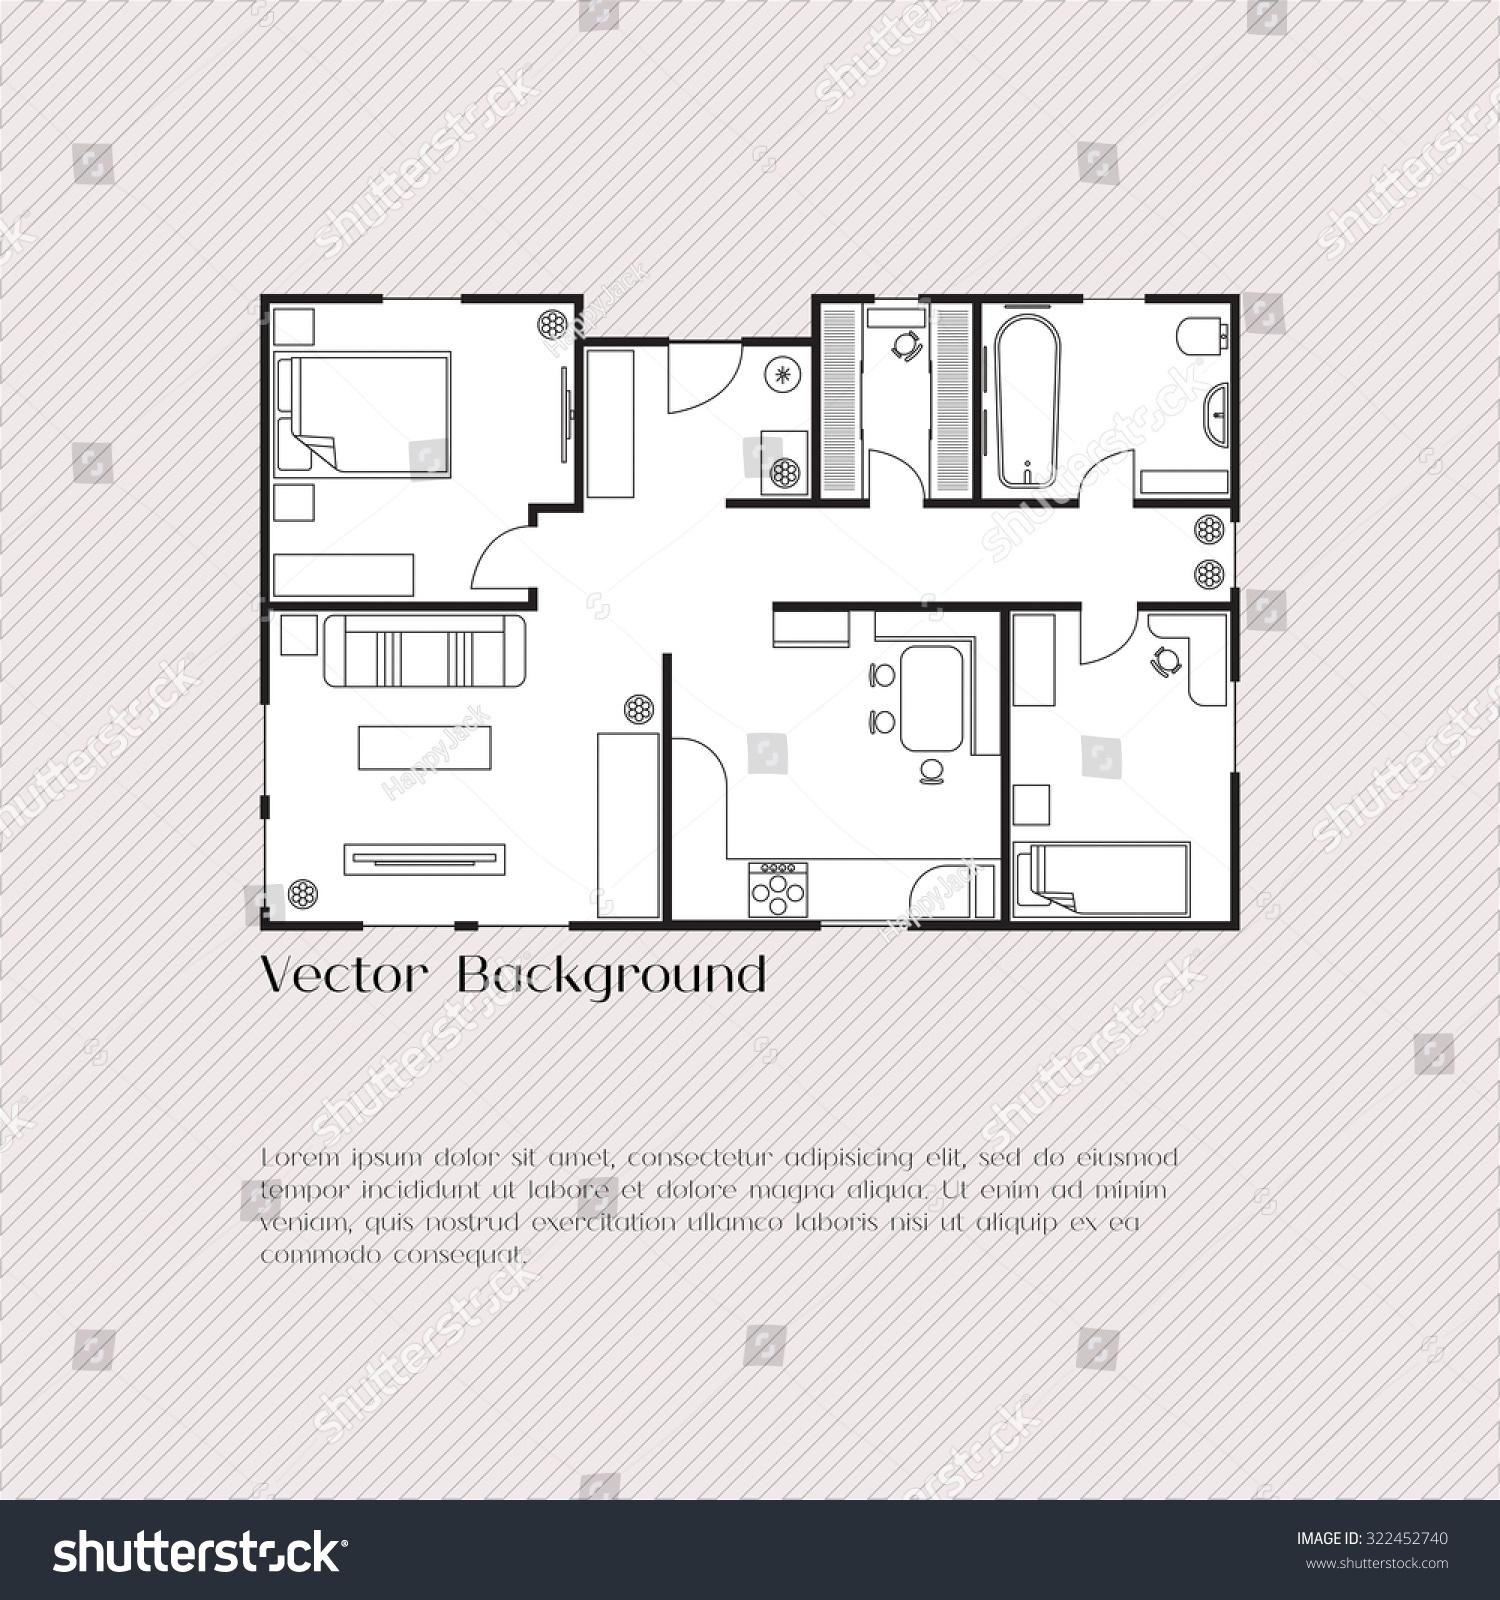 house plan background card banner presentation stock vector, Presentation templates